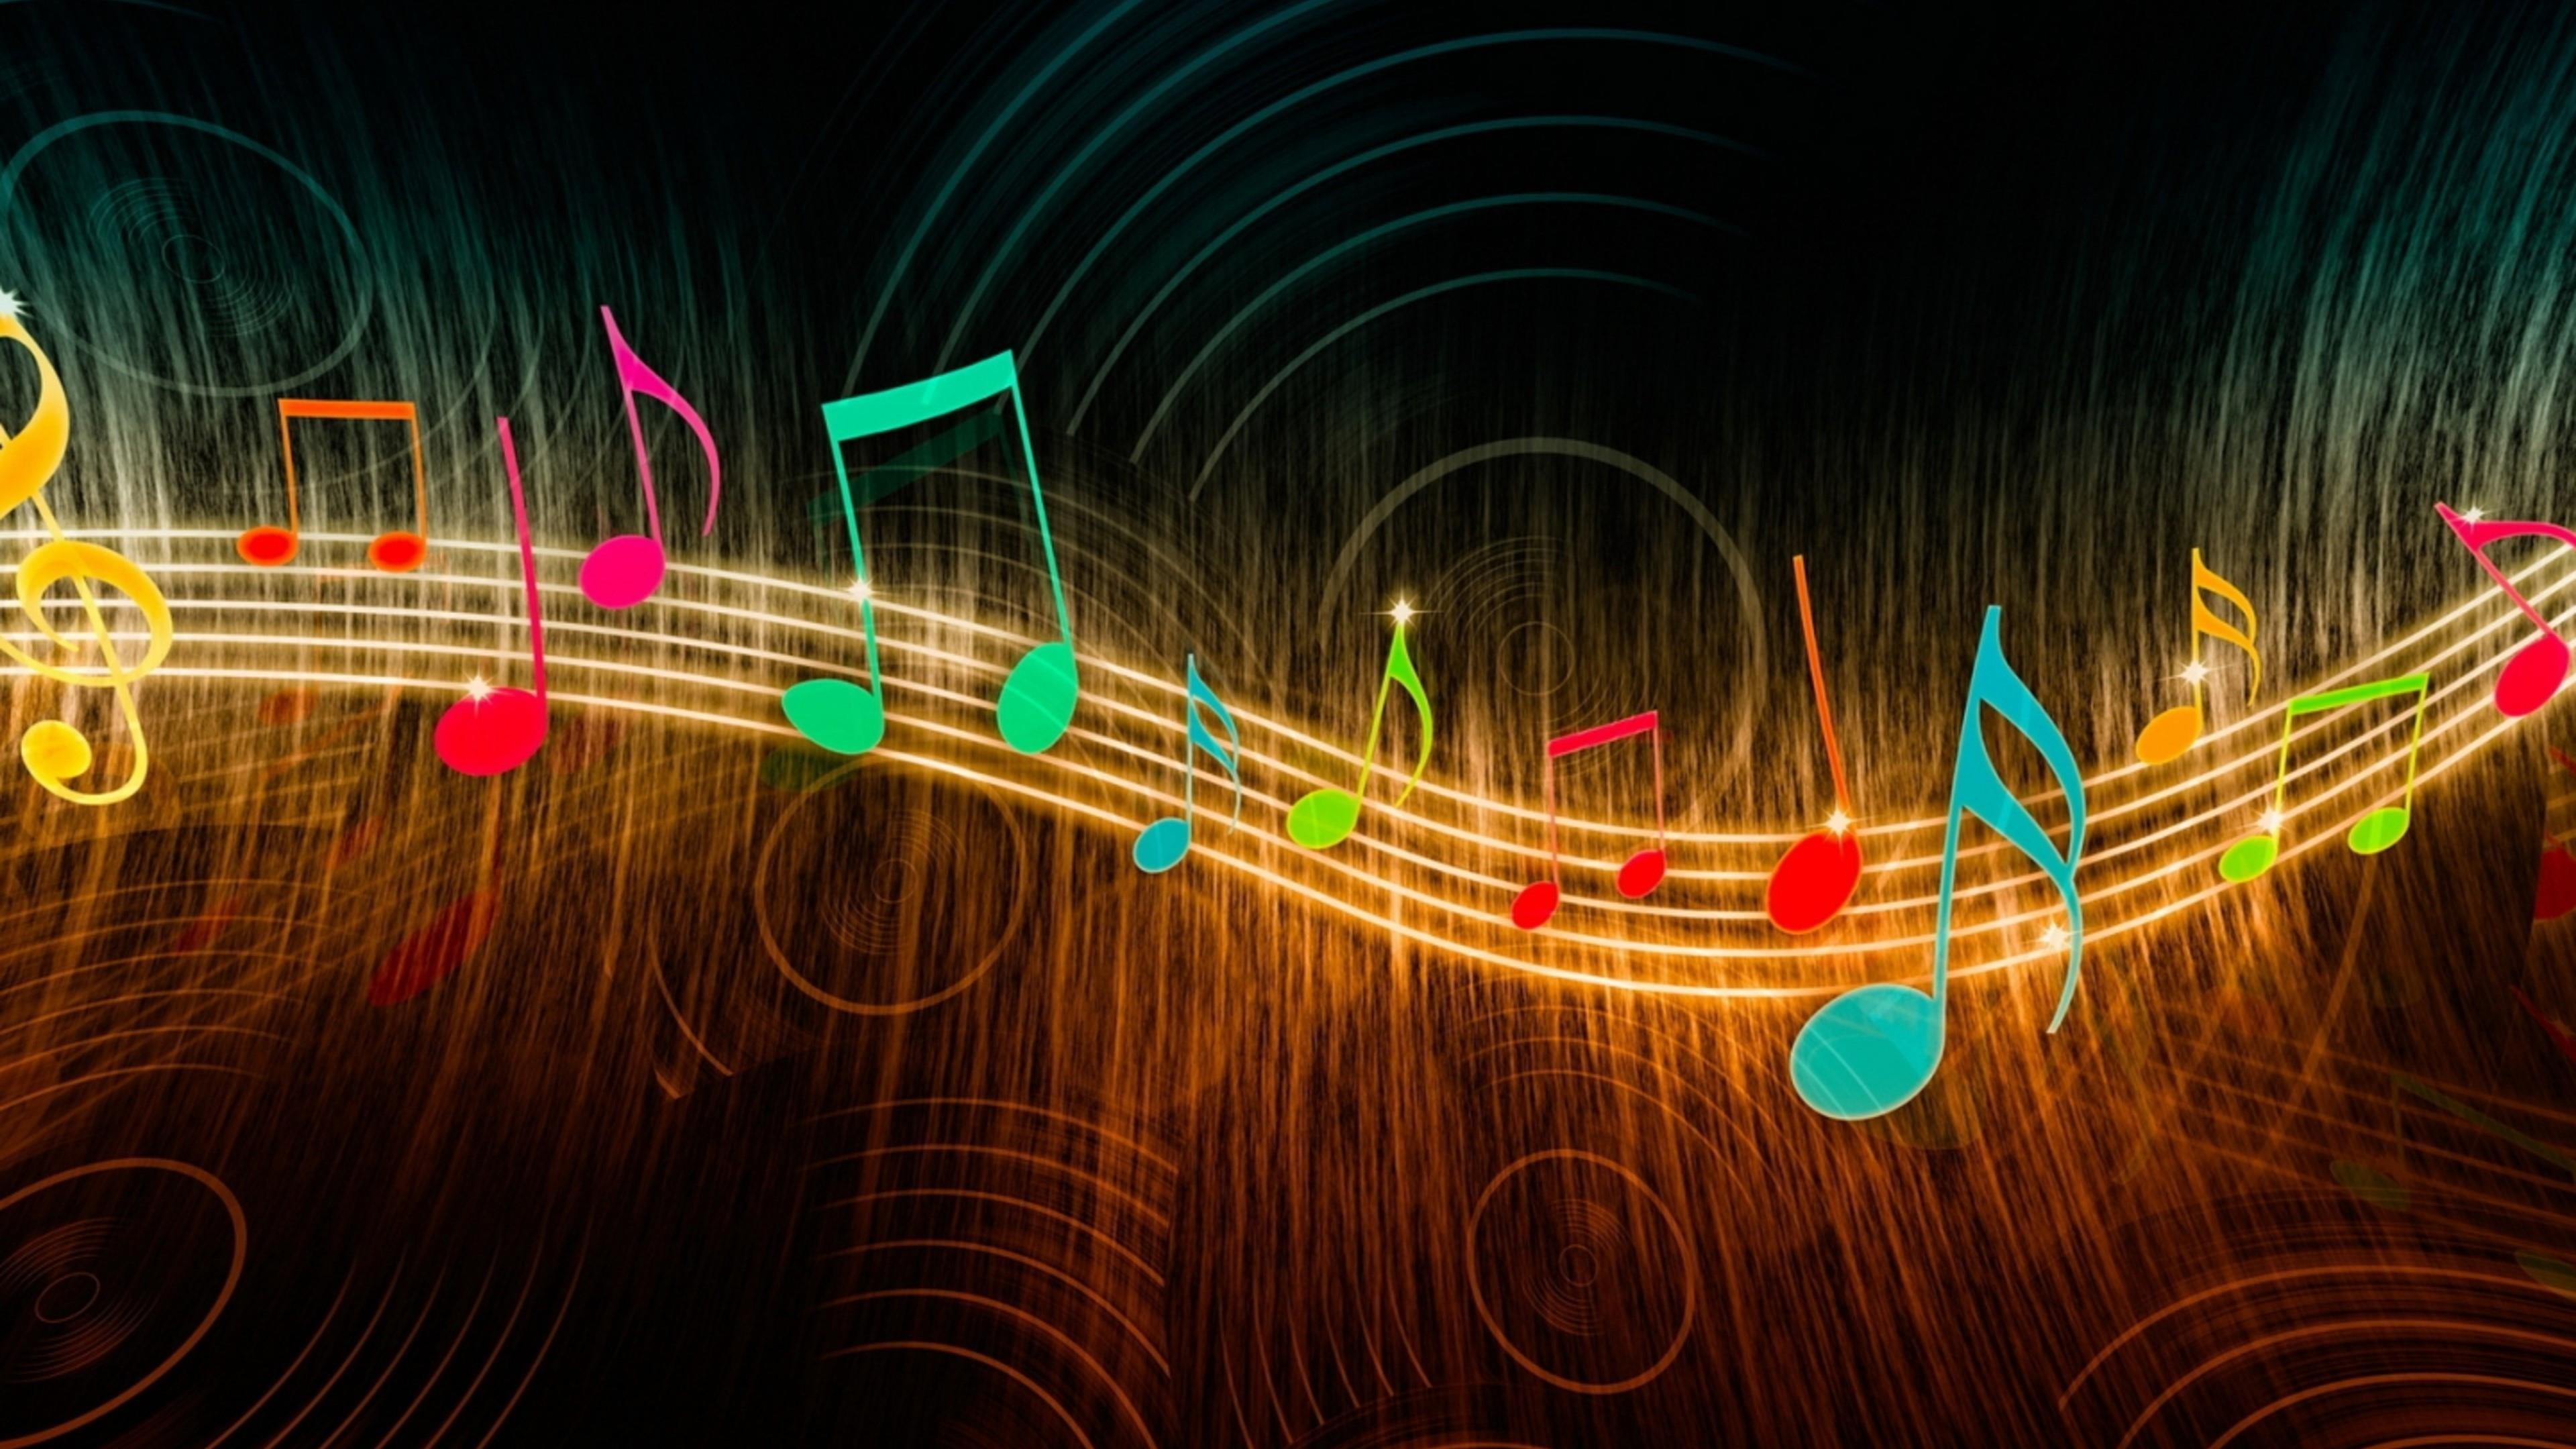 Музыка из заставки дом 2 5